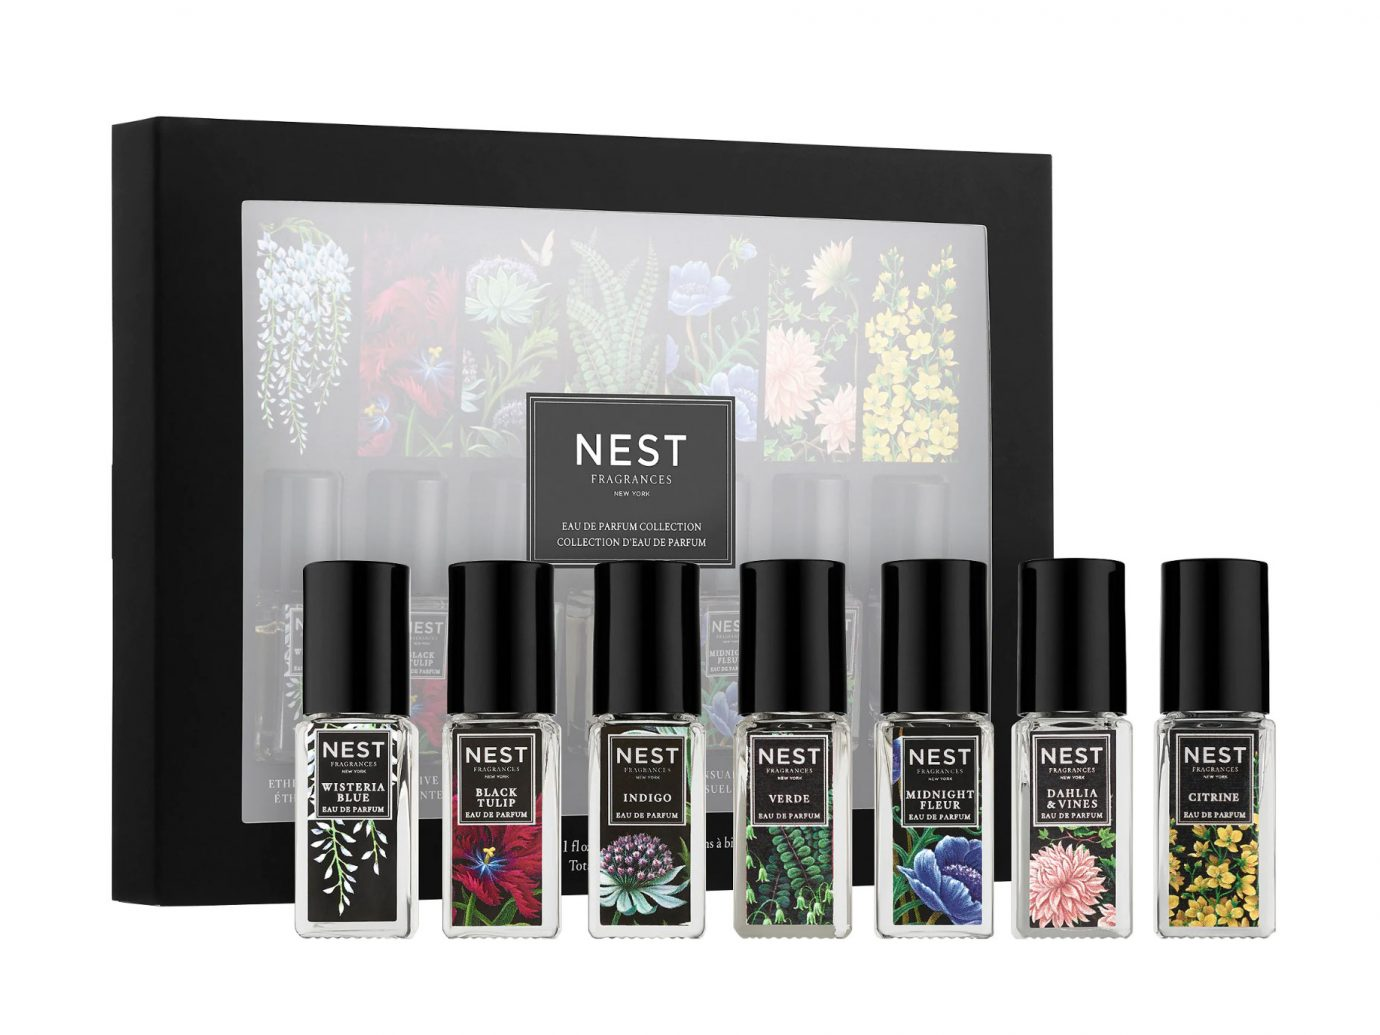 Nest Eau de Parfum Rollerball Collection